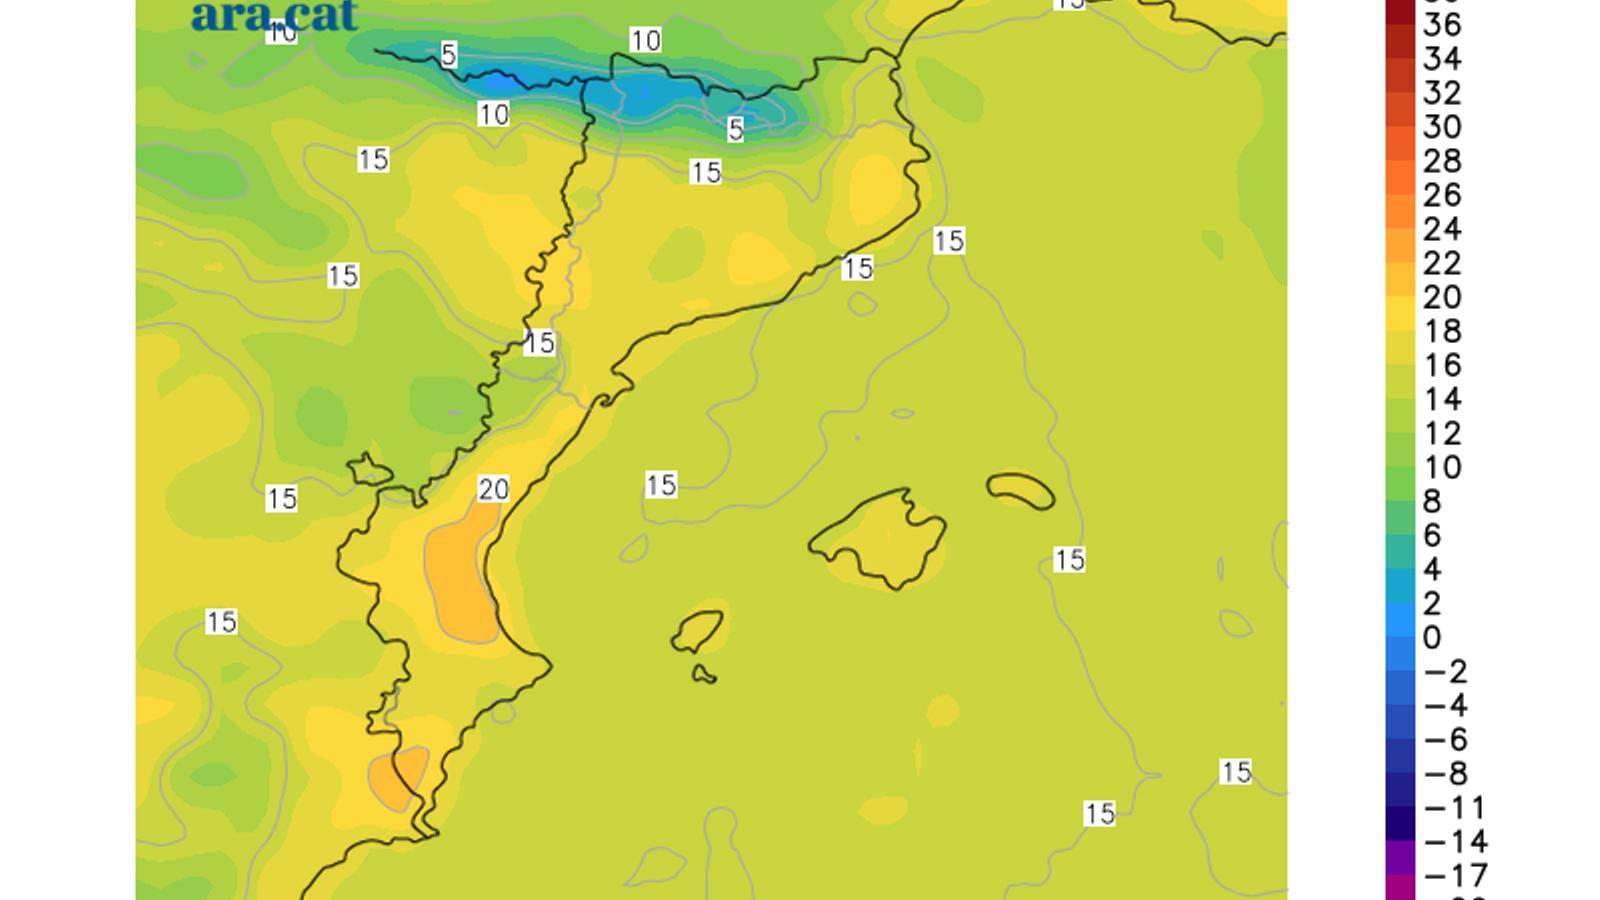 Temperatura màxima prevista per demà